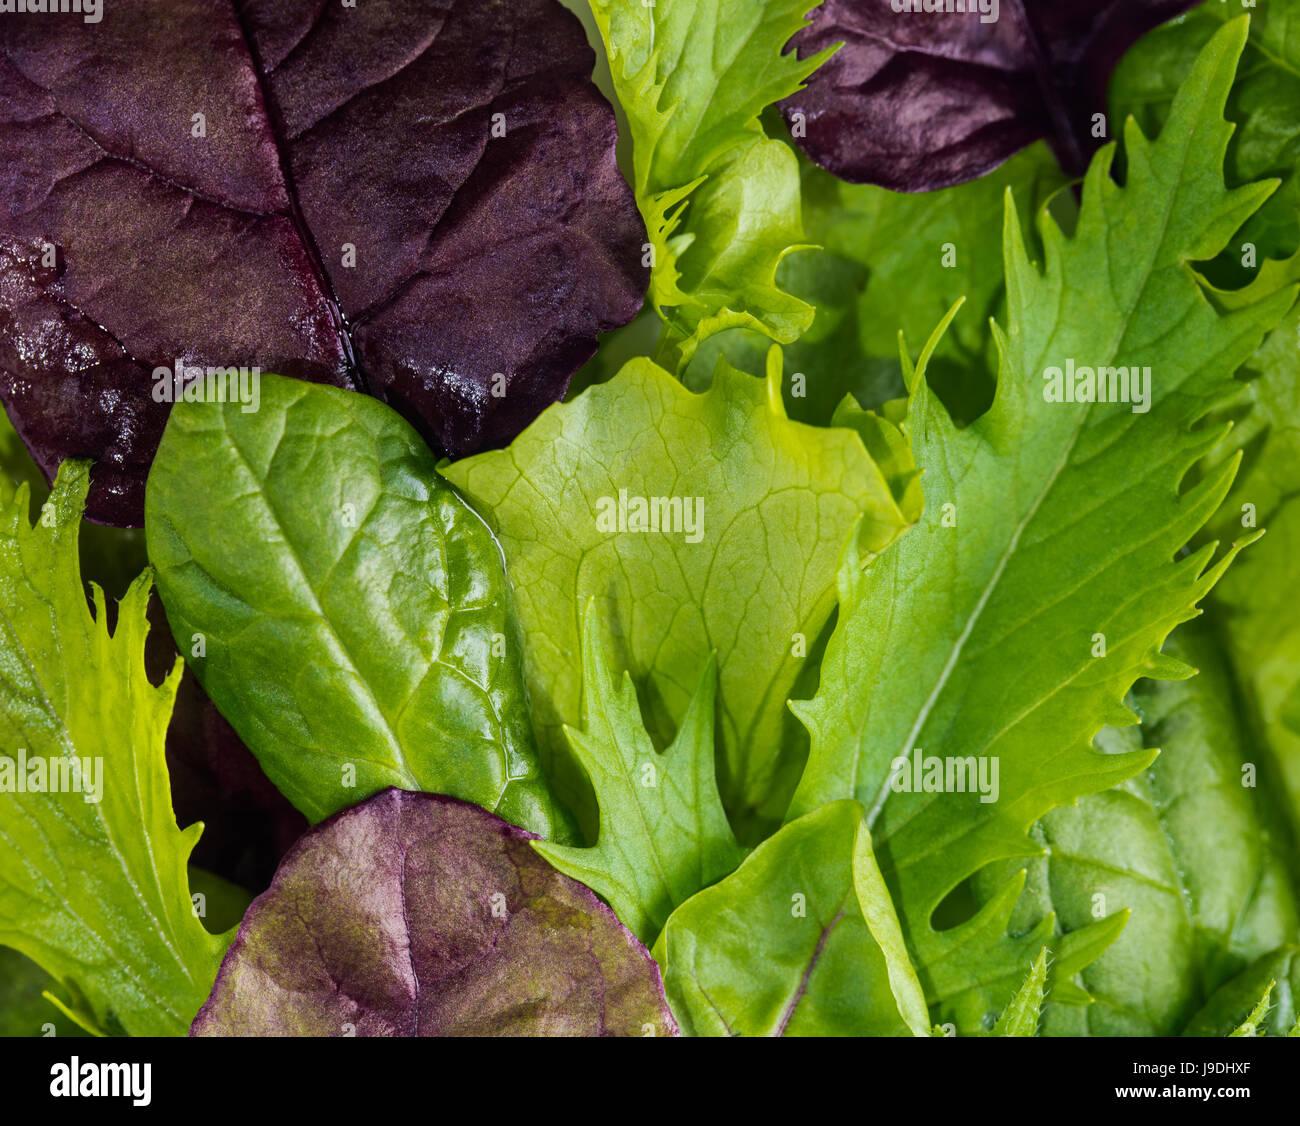 Resumen fondo natural de textura de hojas de lechuga Foto de stock